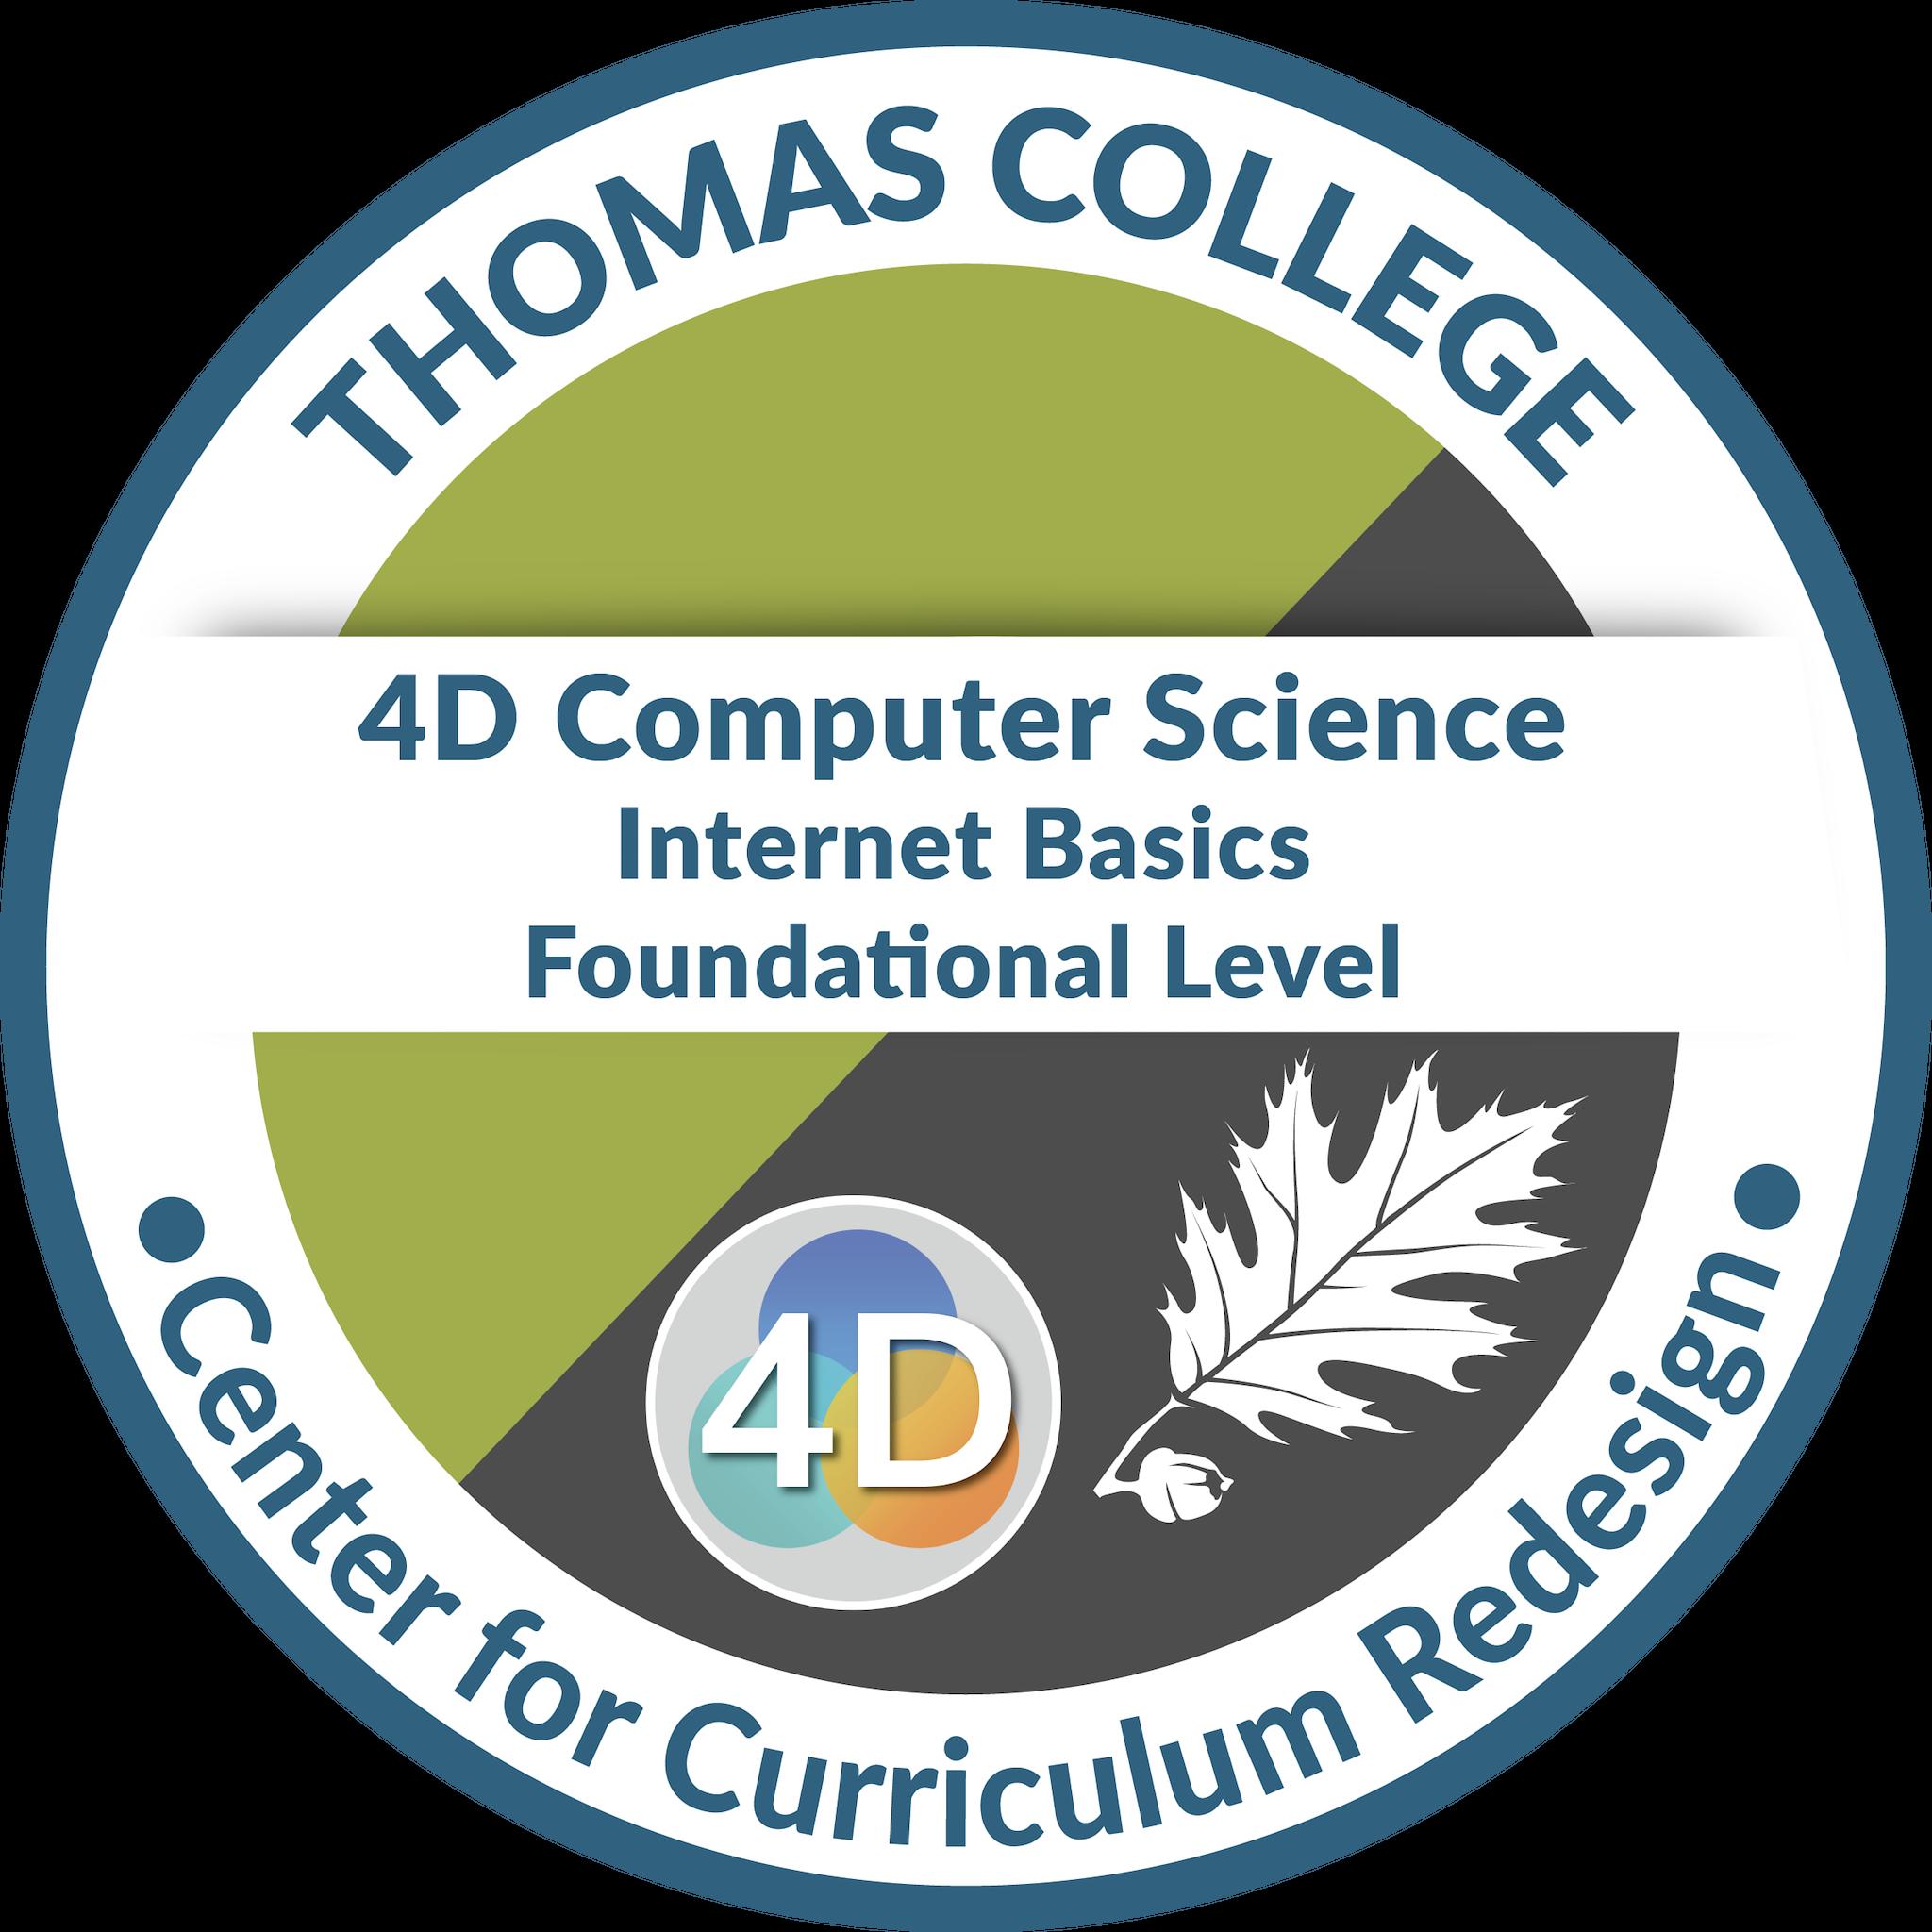 4D Computer Science: Internet Basics